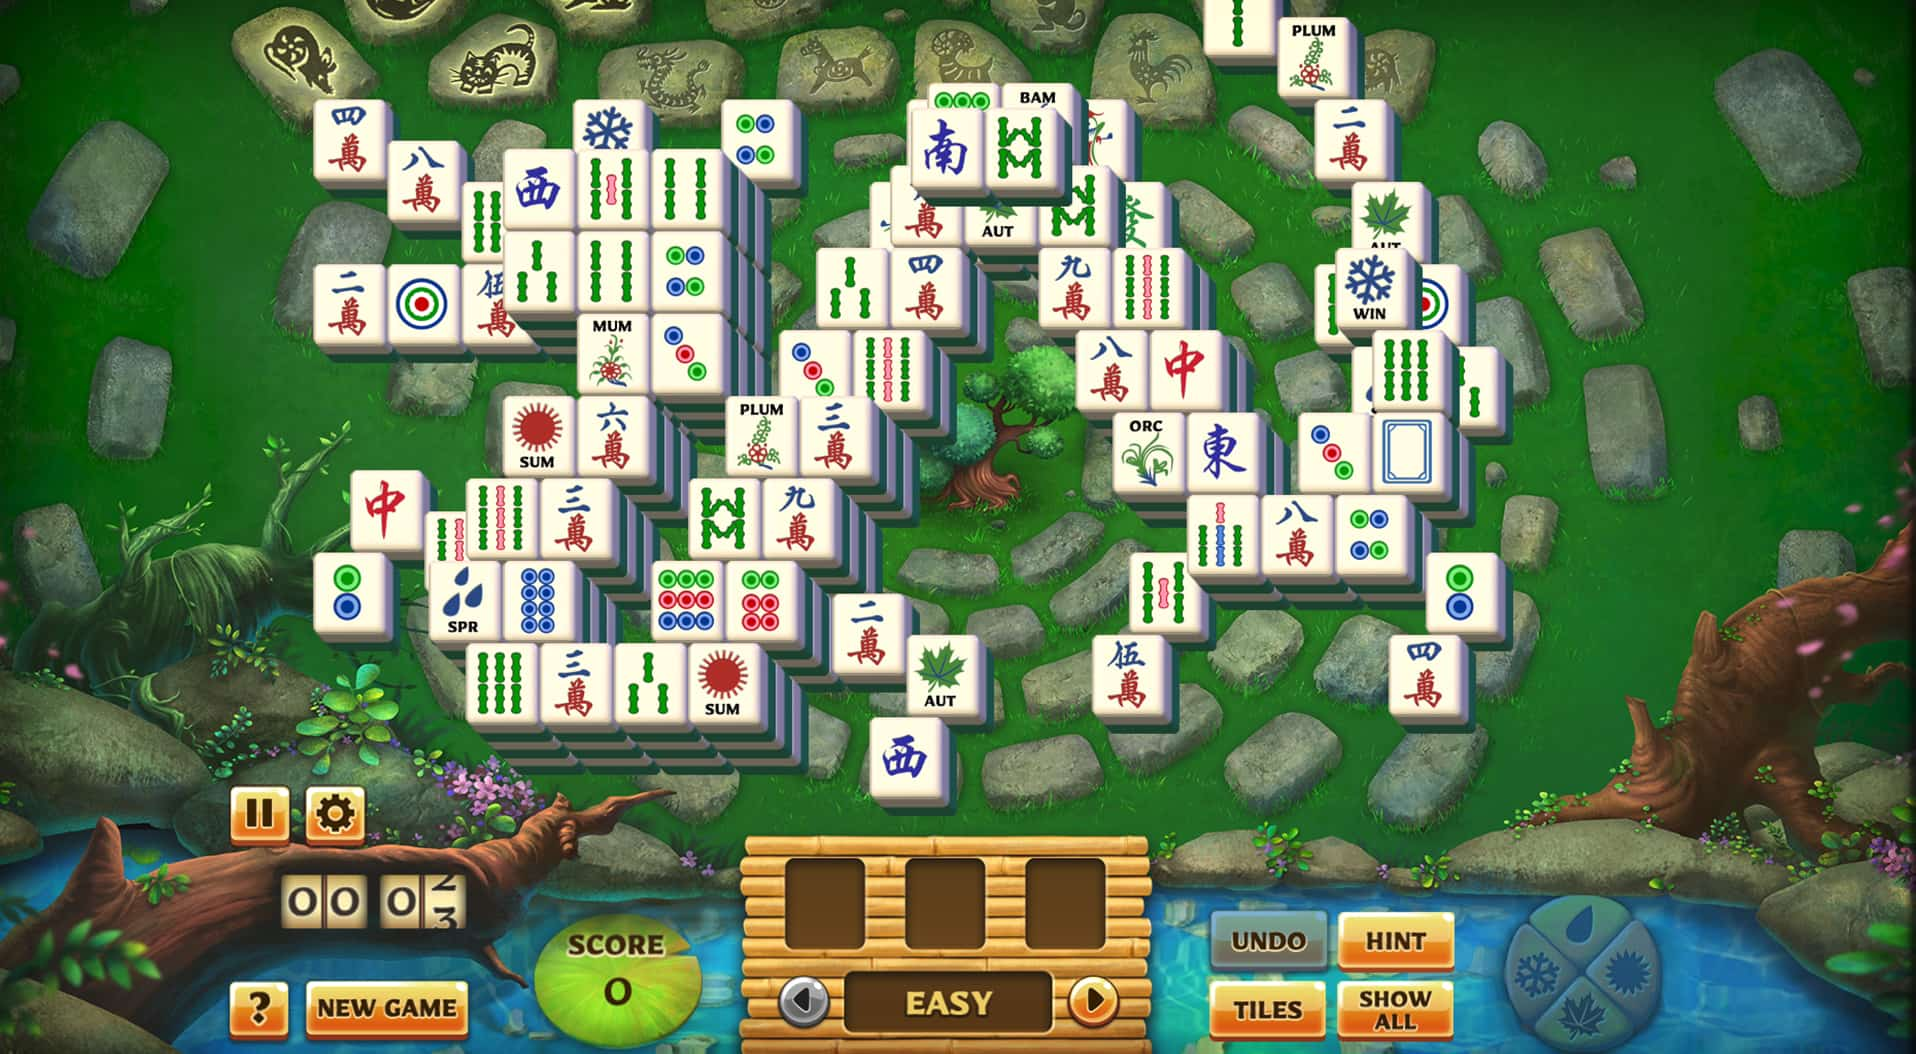 Winnerama online casino